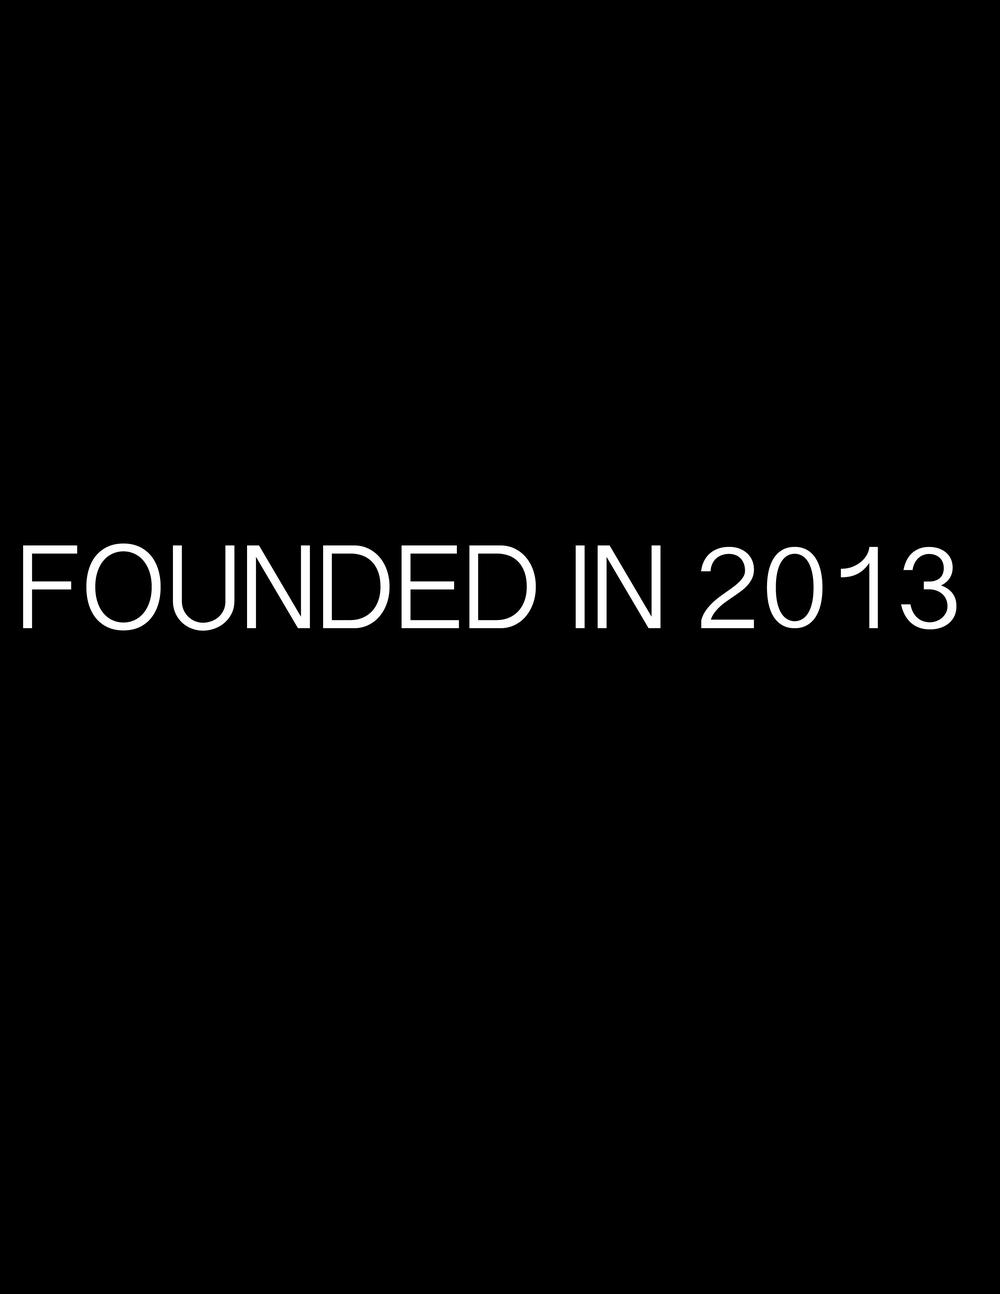 Foundedin2013.png